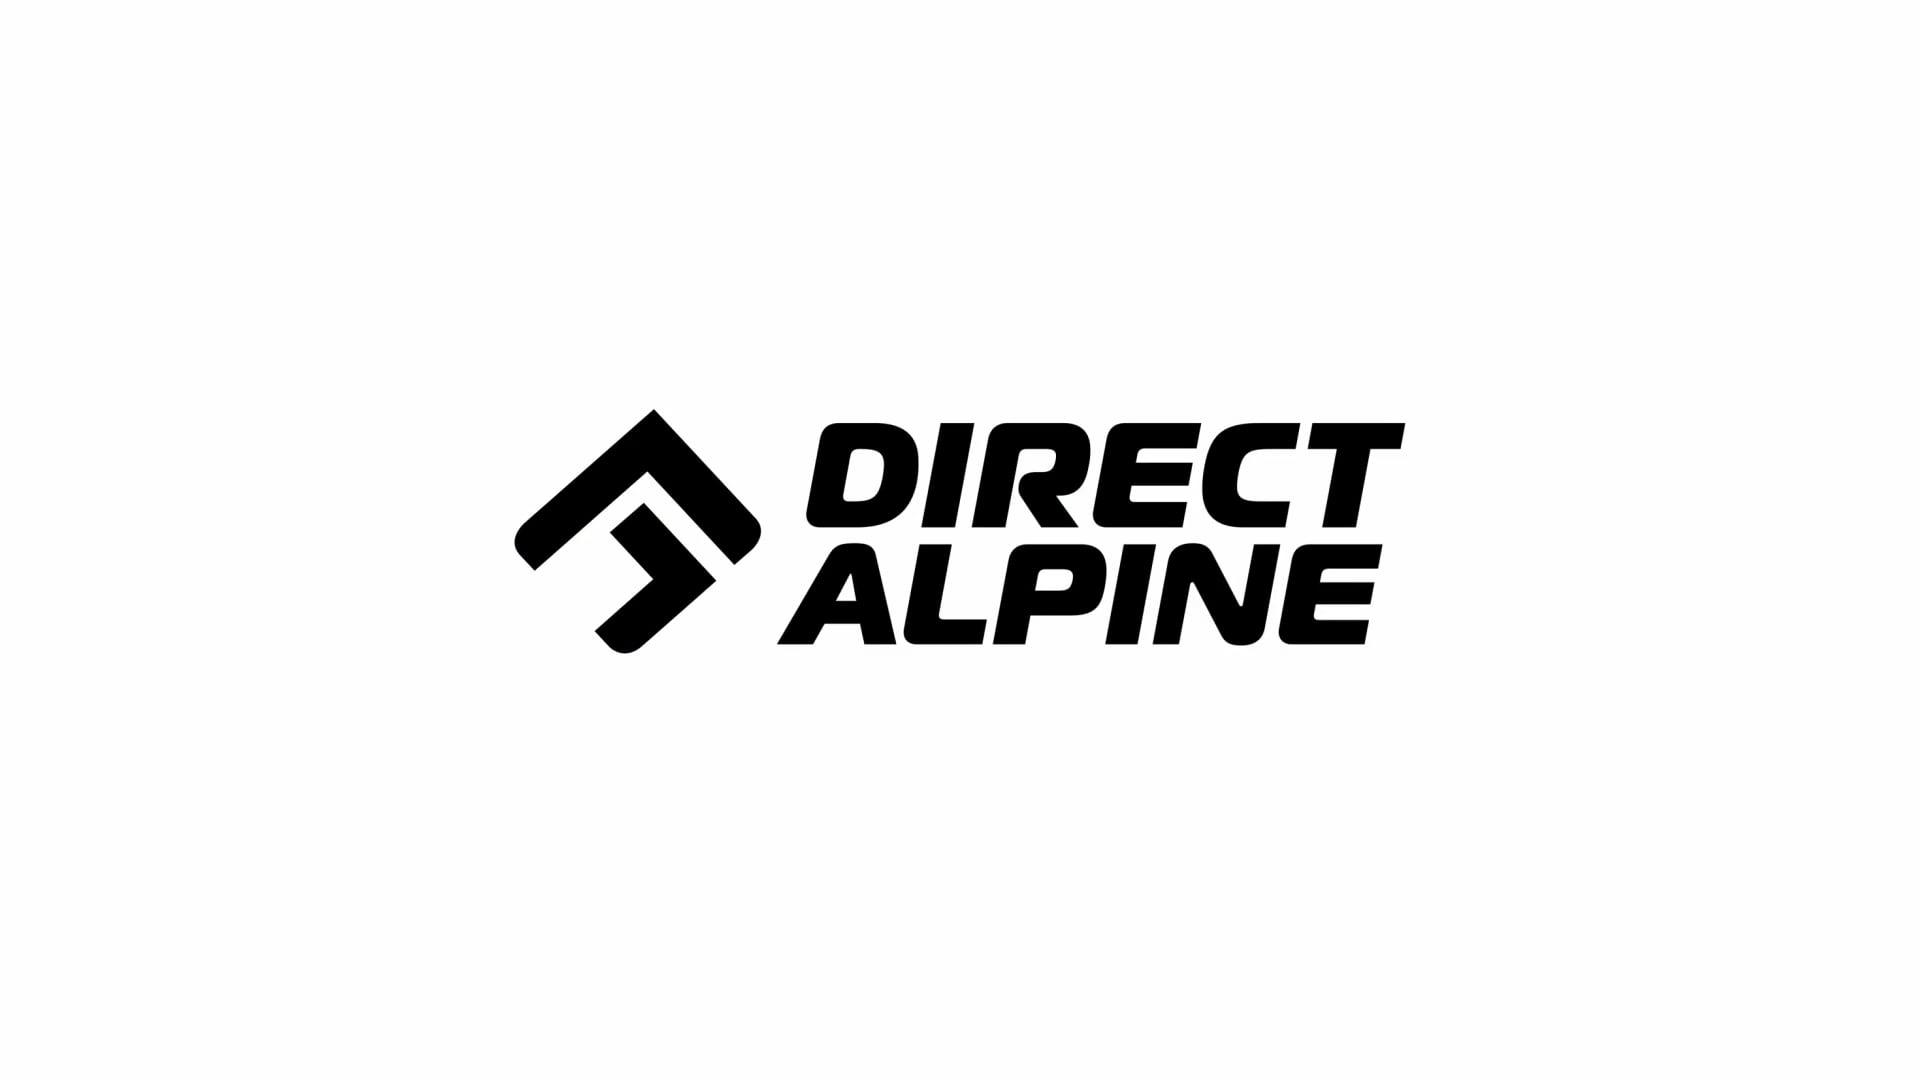 DIRECT ALPINE 2019